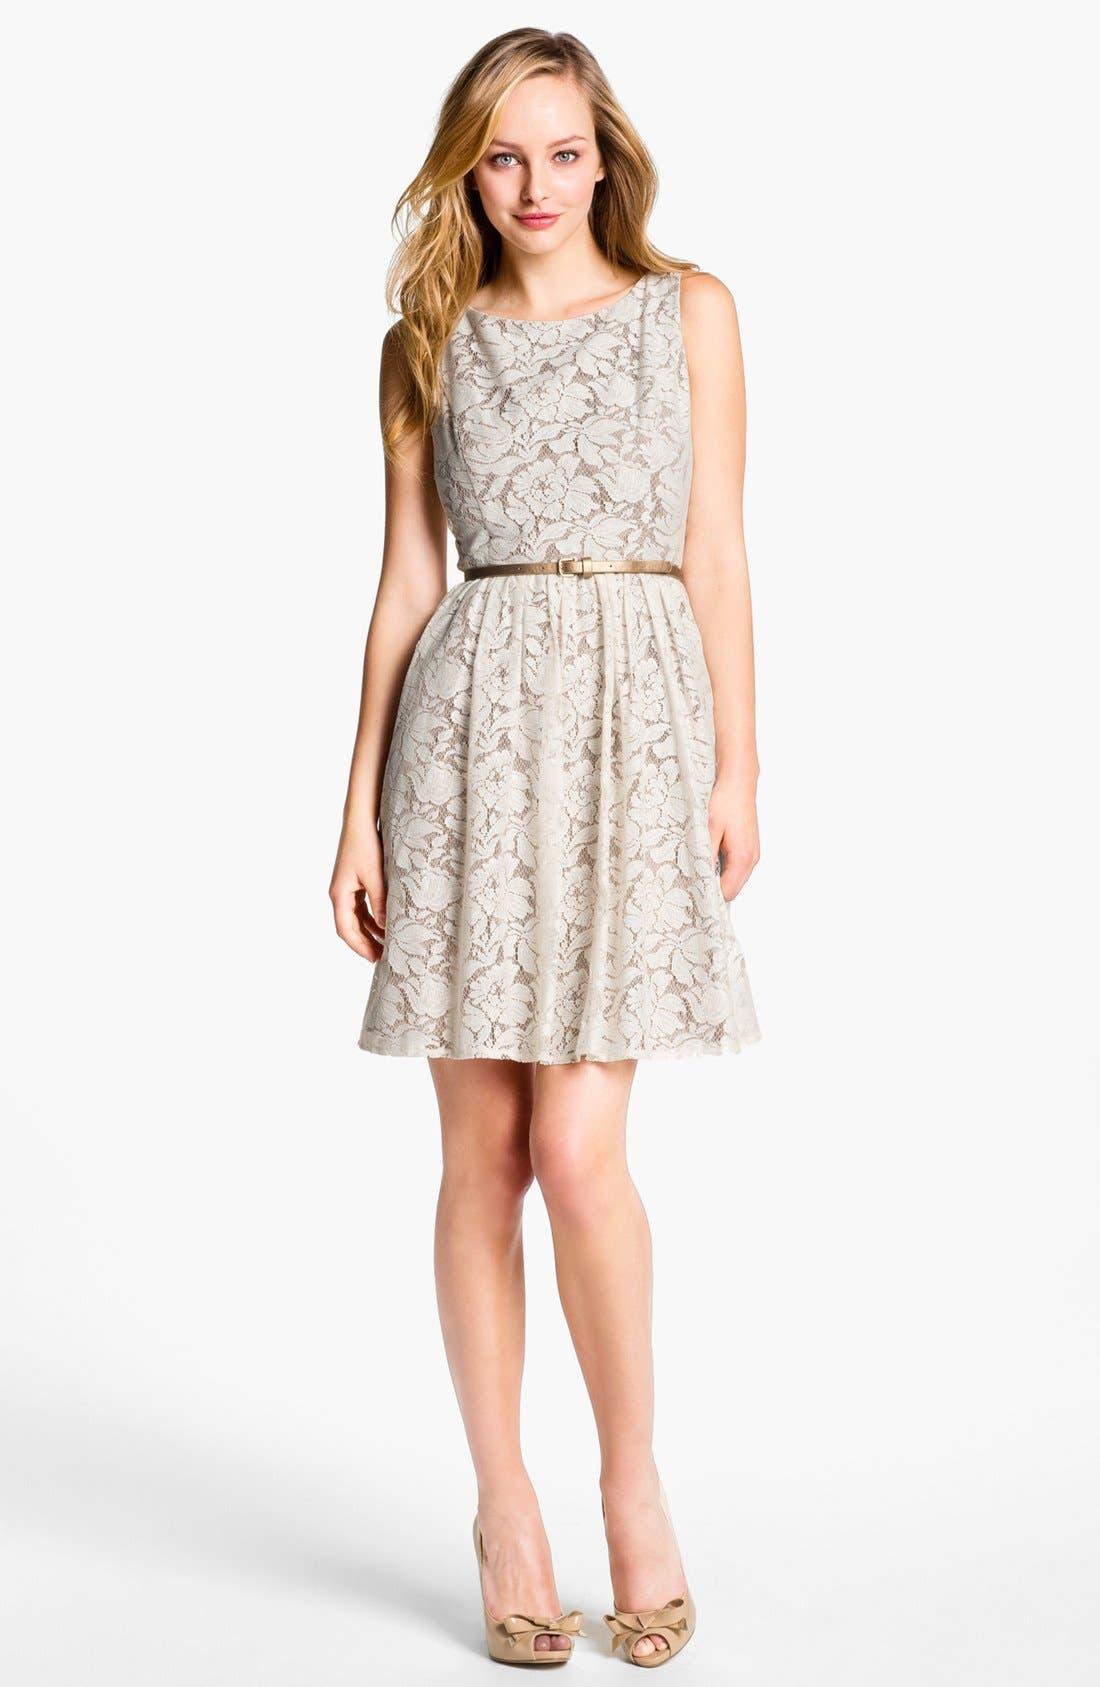 Alternate Image 1 Selected - Eliza J Lace Fit & Flare Dress (Petite)